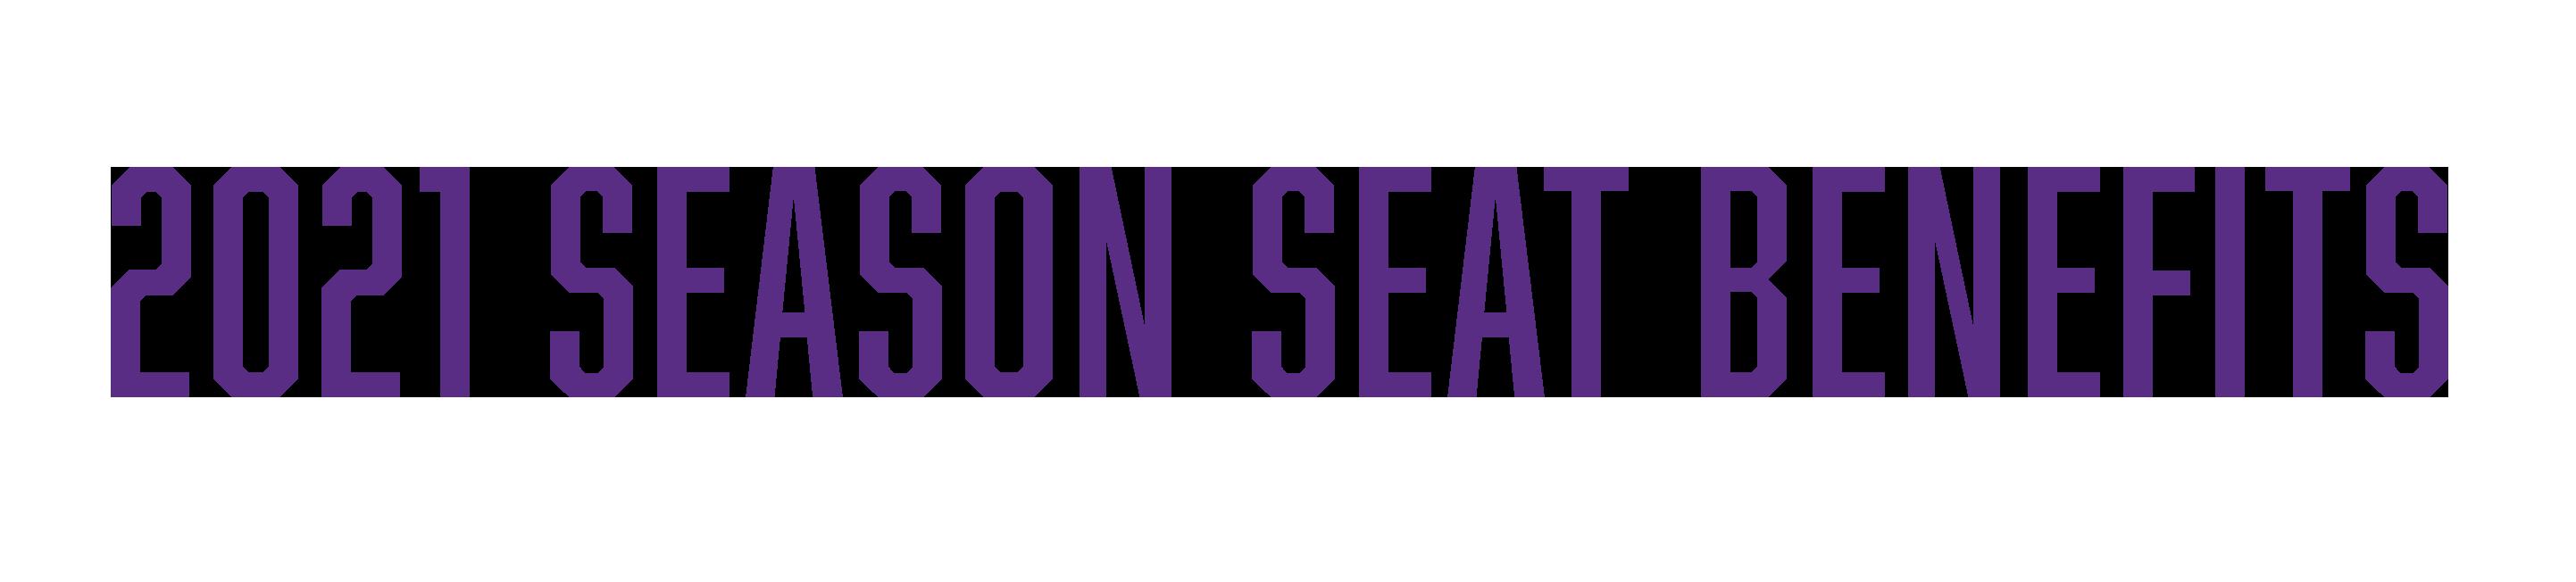 2021 Season Benefits Banner